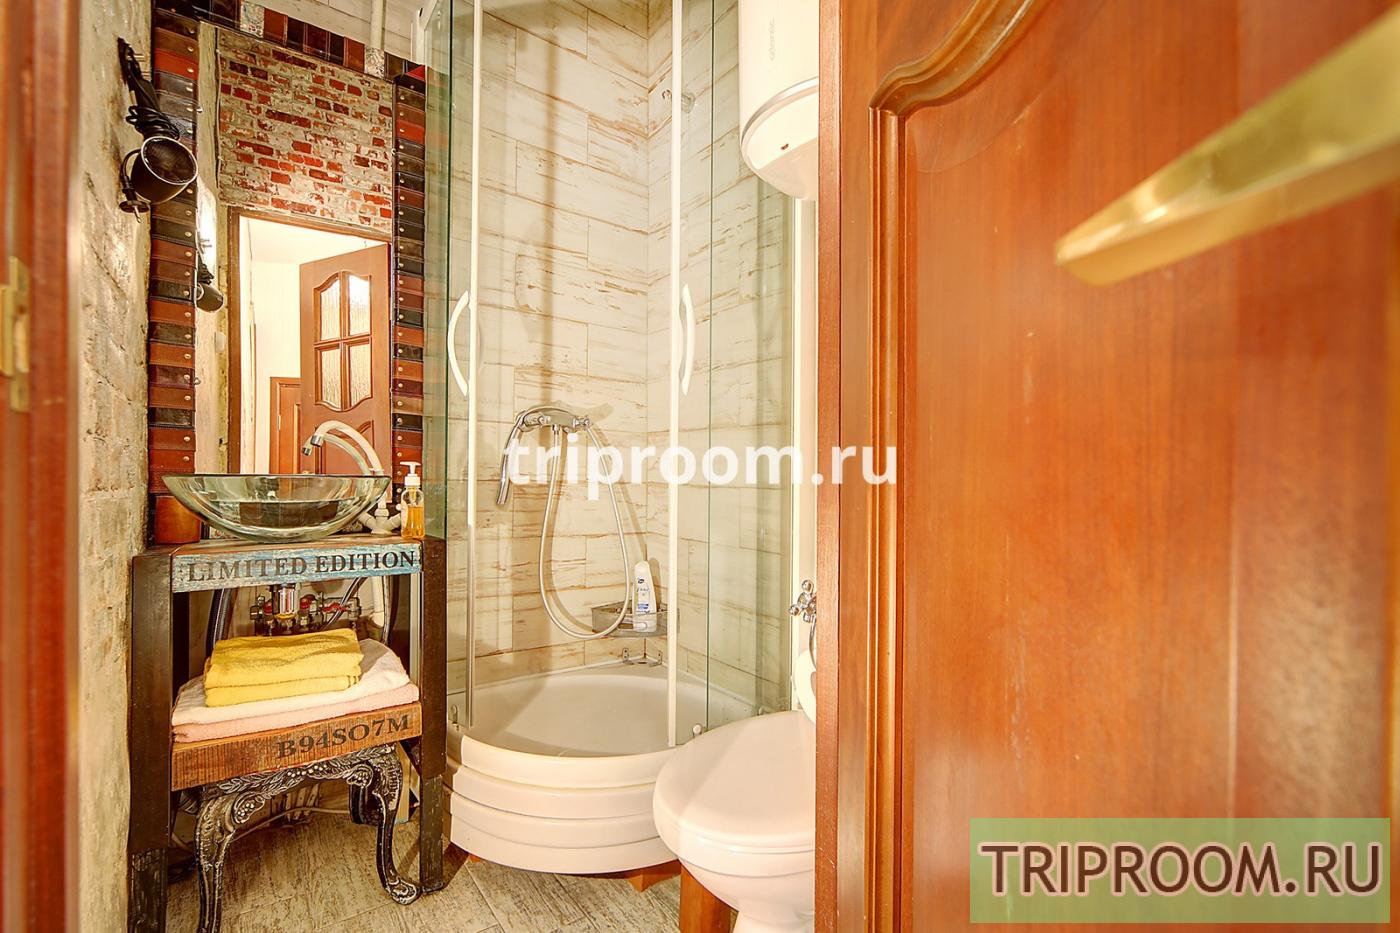 1-комнатная квартира посуточно (вариант № 15445), ул. Лиговский проспект, фото № 16